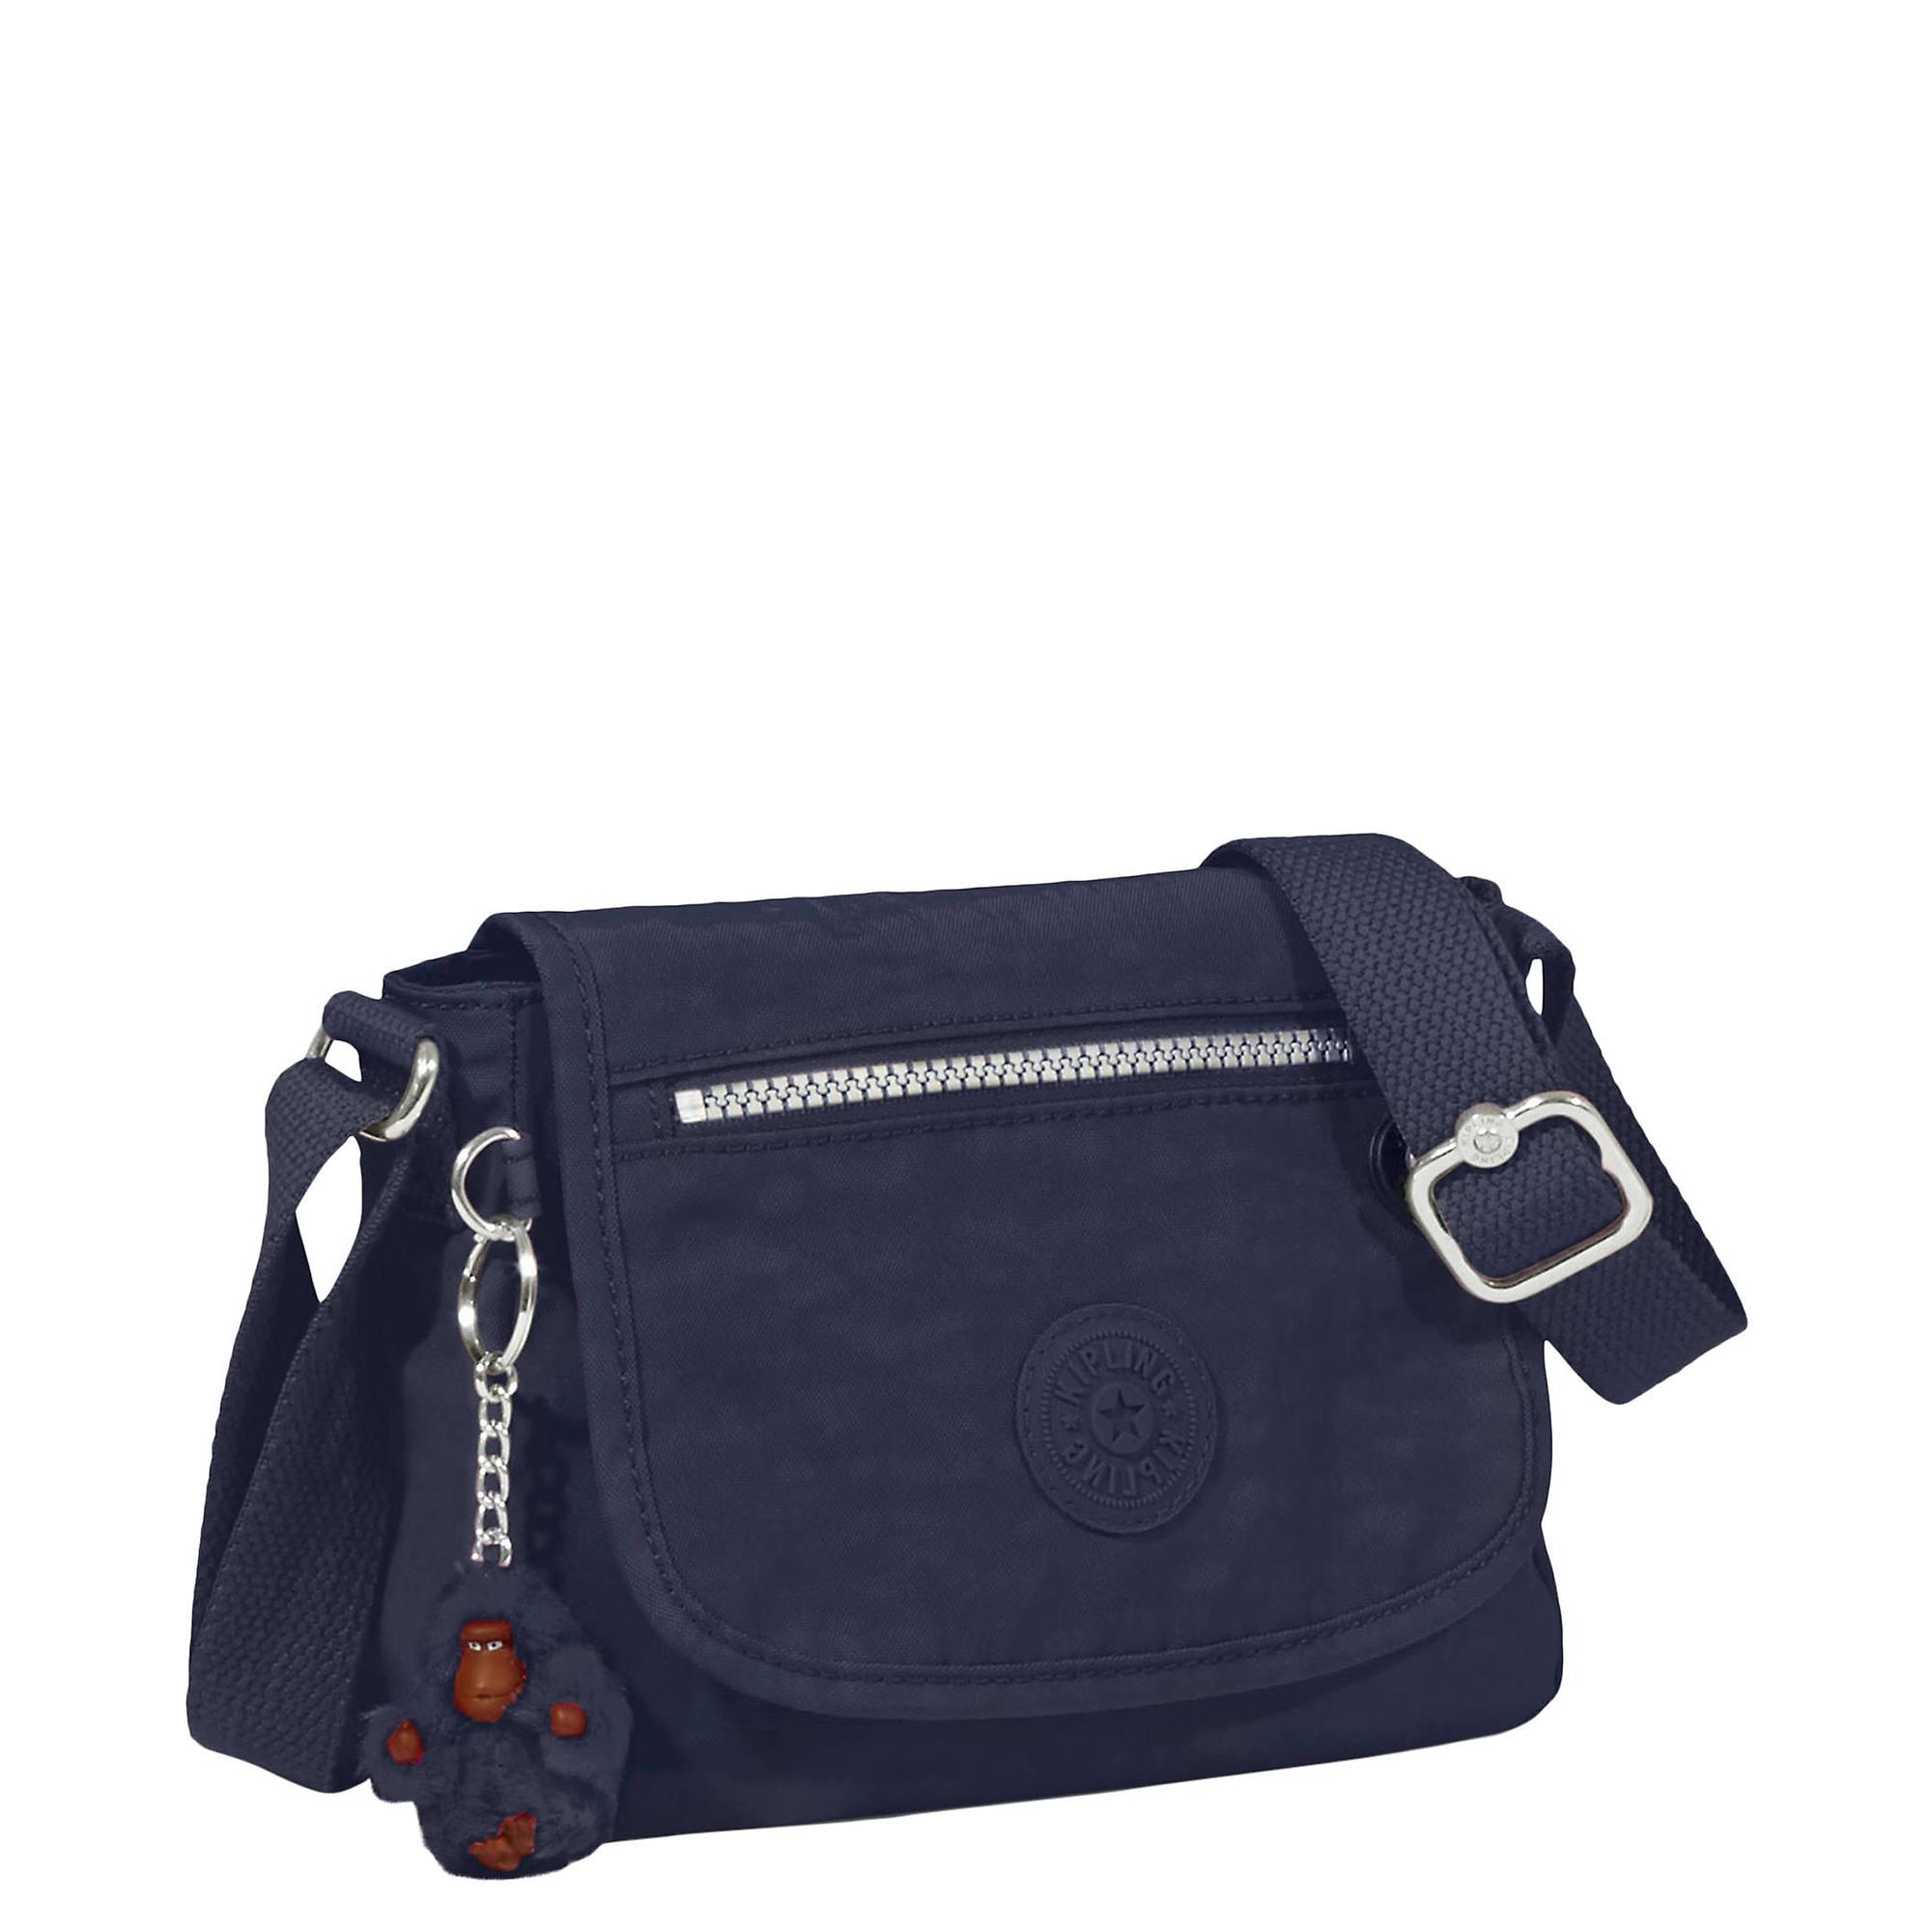 89412896a8b8 Sabian Crossbody Minibag - True Blue Classic